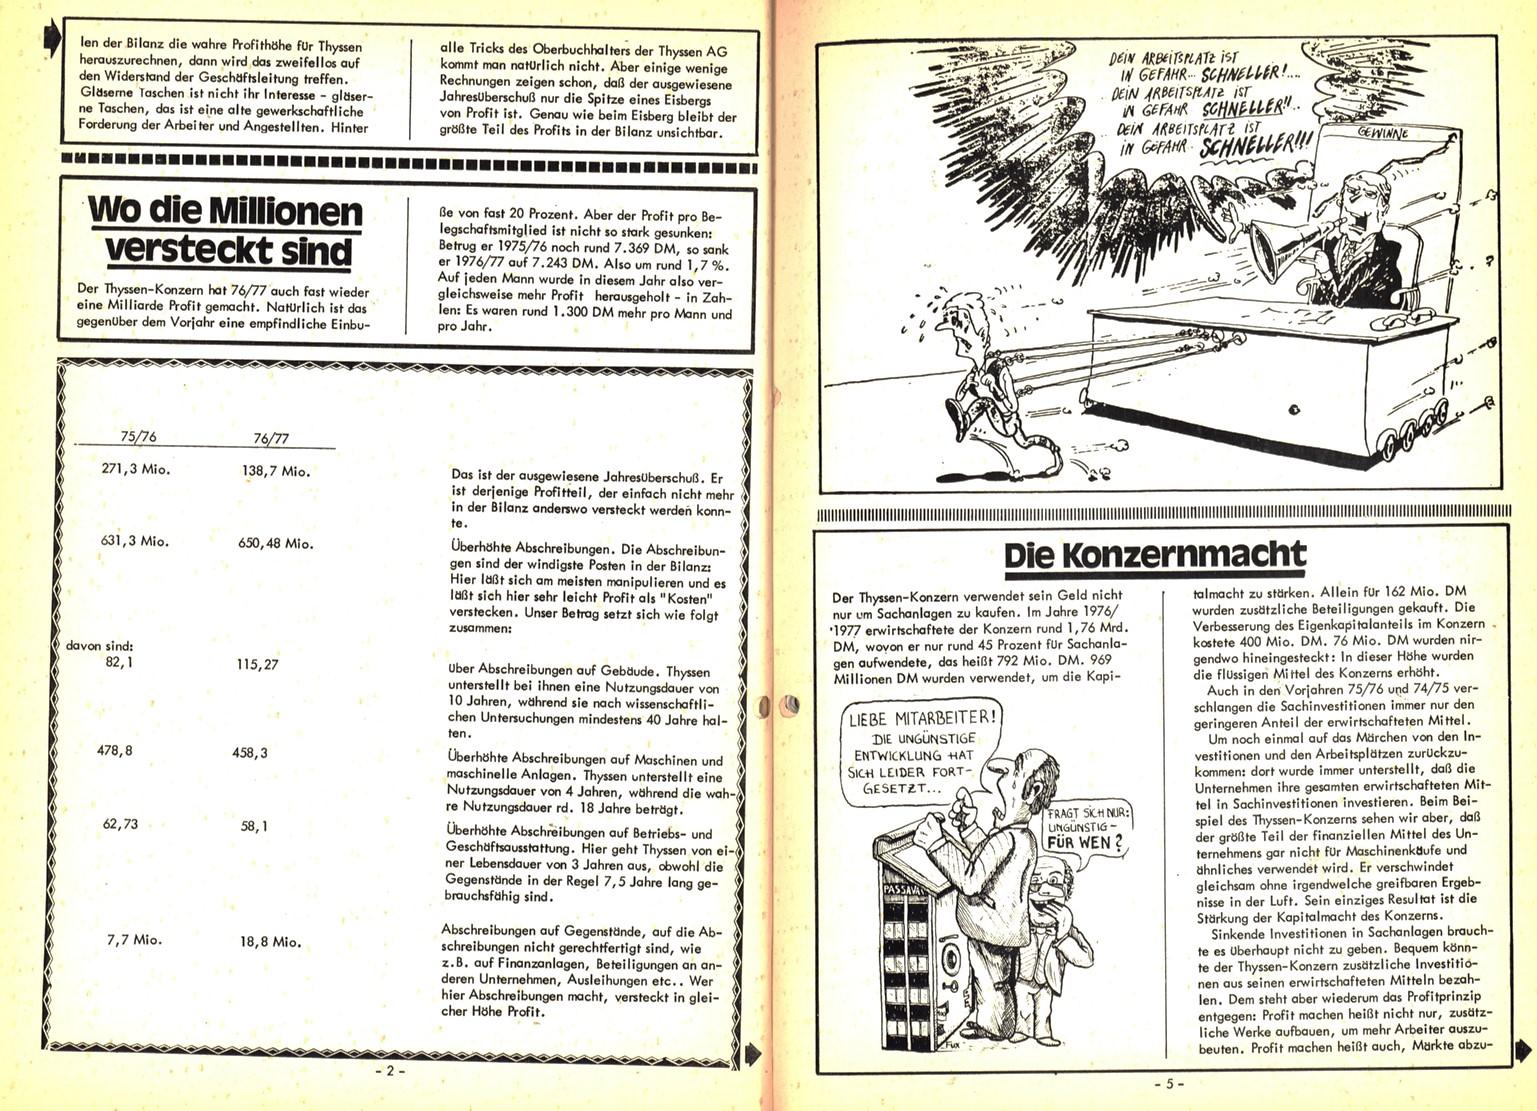 GE_DKP_Stahlstimme_19780500_02